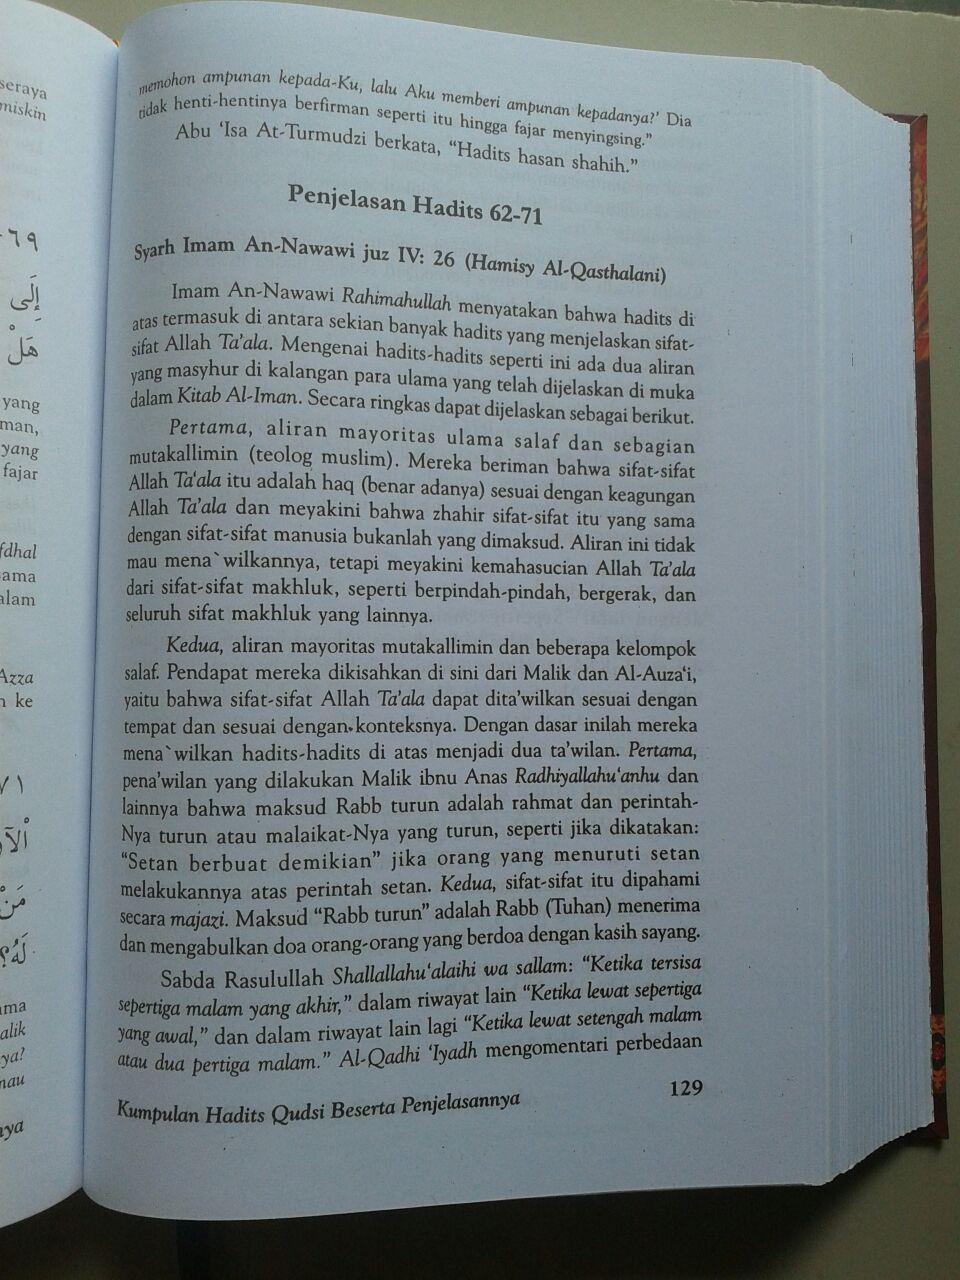 Buku Kumpulan Hadits Qudsi Berserta Penjelasannya isi 3